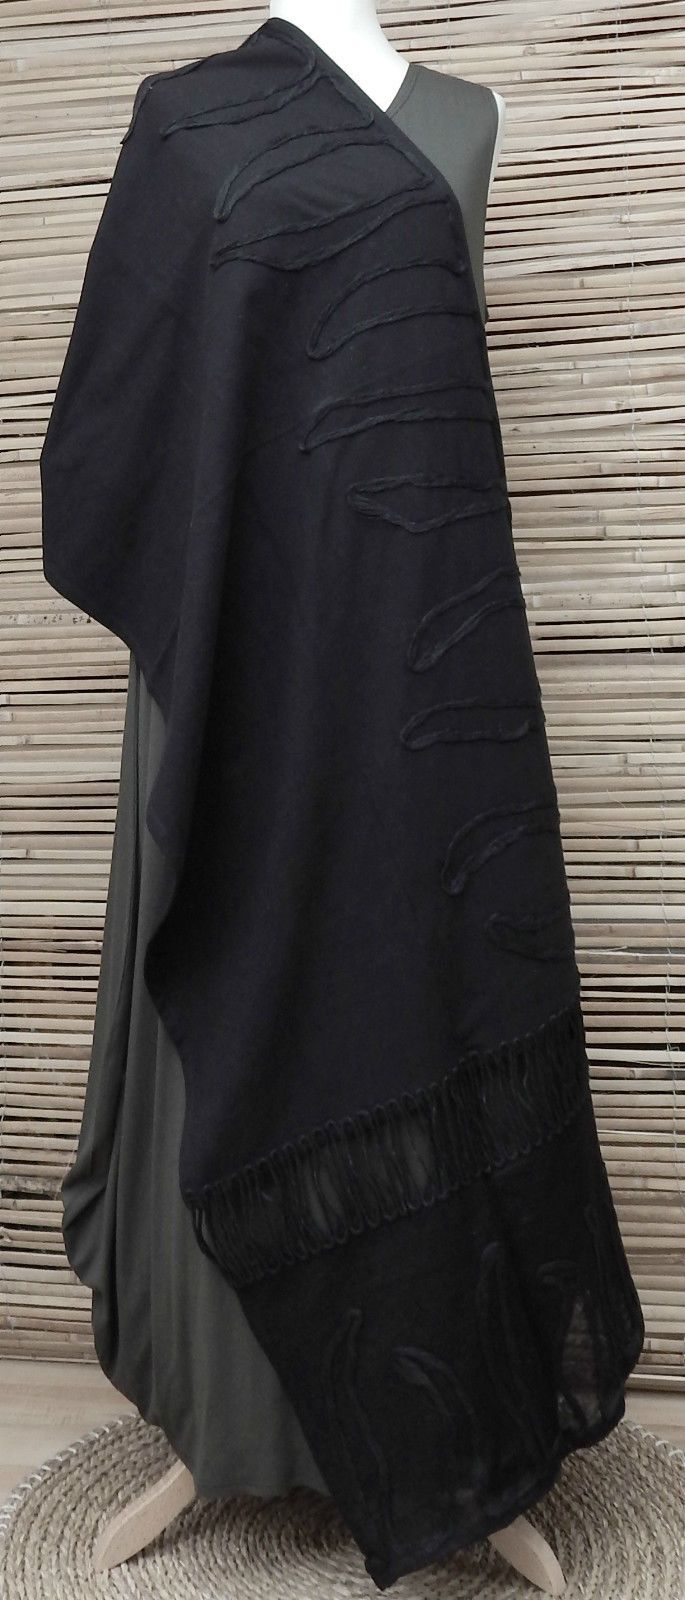 *ZUZA BART*DESIGN EXCLUSIVE BEAUTIFUL APPLIQUE COTTON SCARF/WRAP/SHAWL*BLACK* | eBay